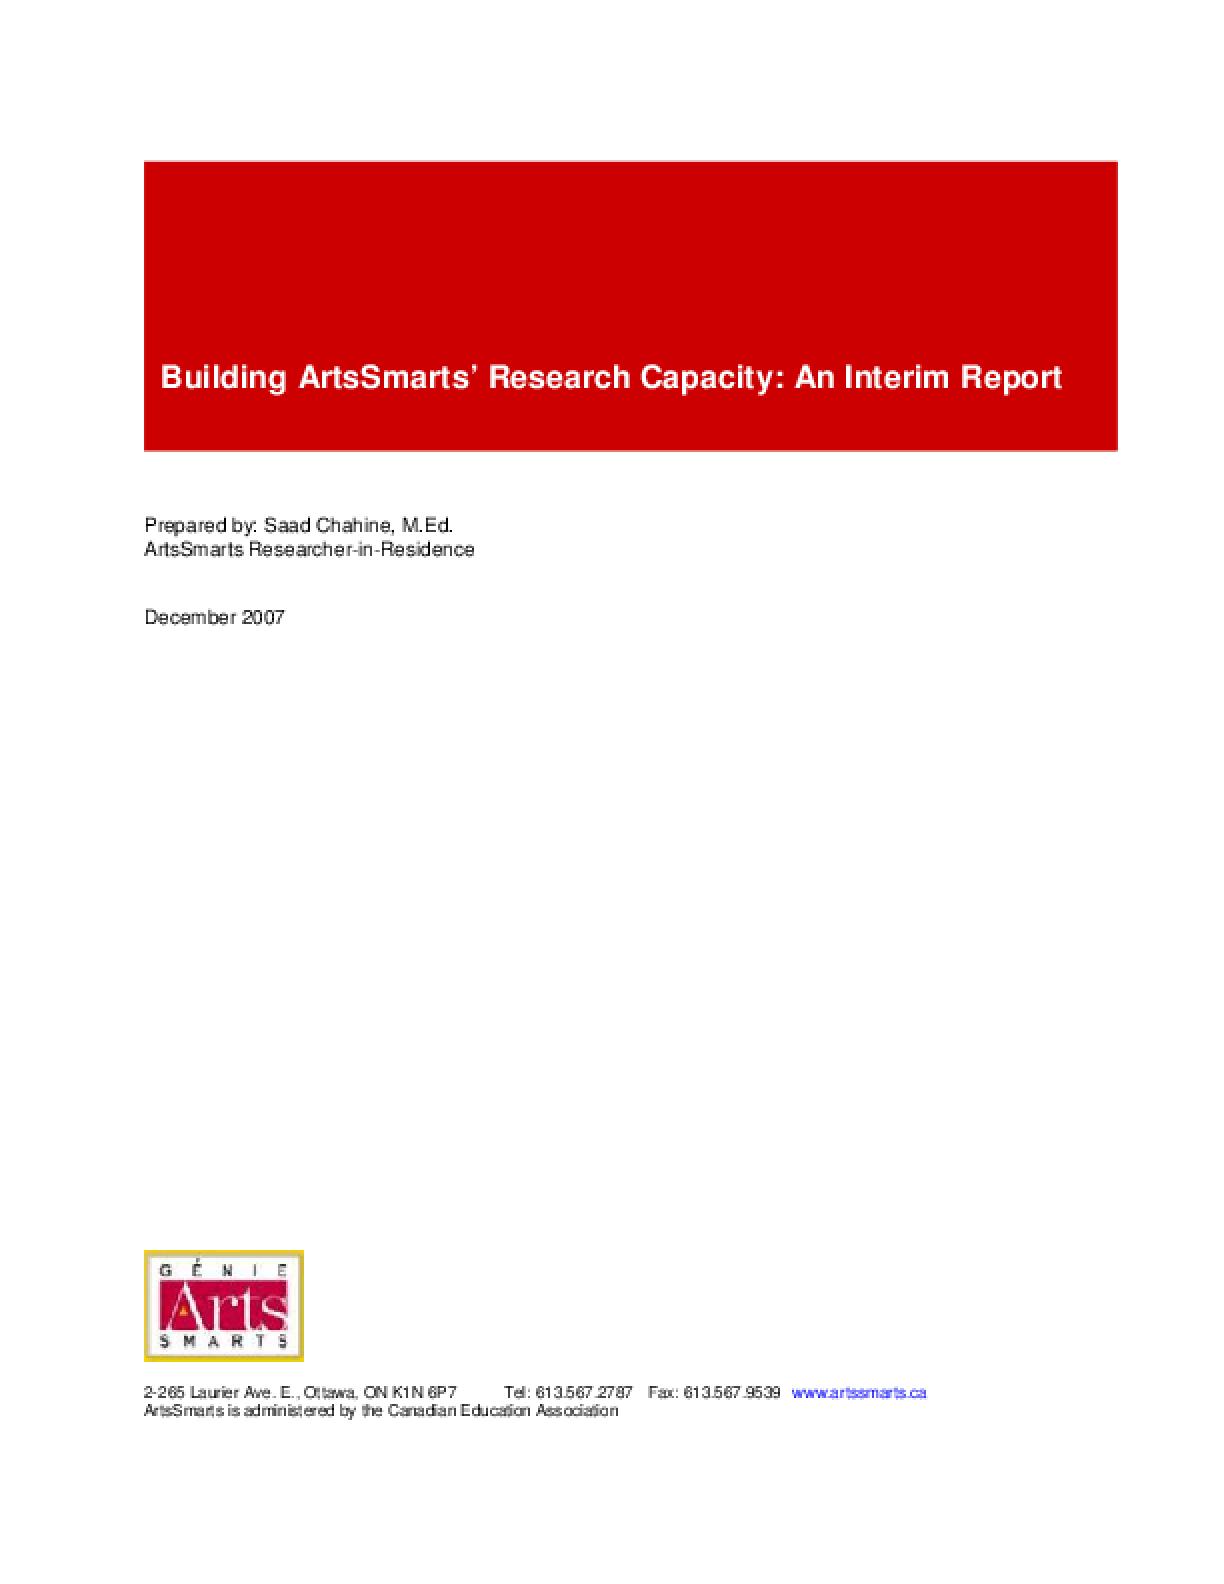 Building ArtsSmarts' Research Capacity: An Interim Report